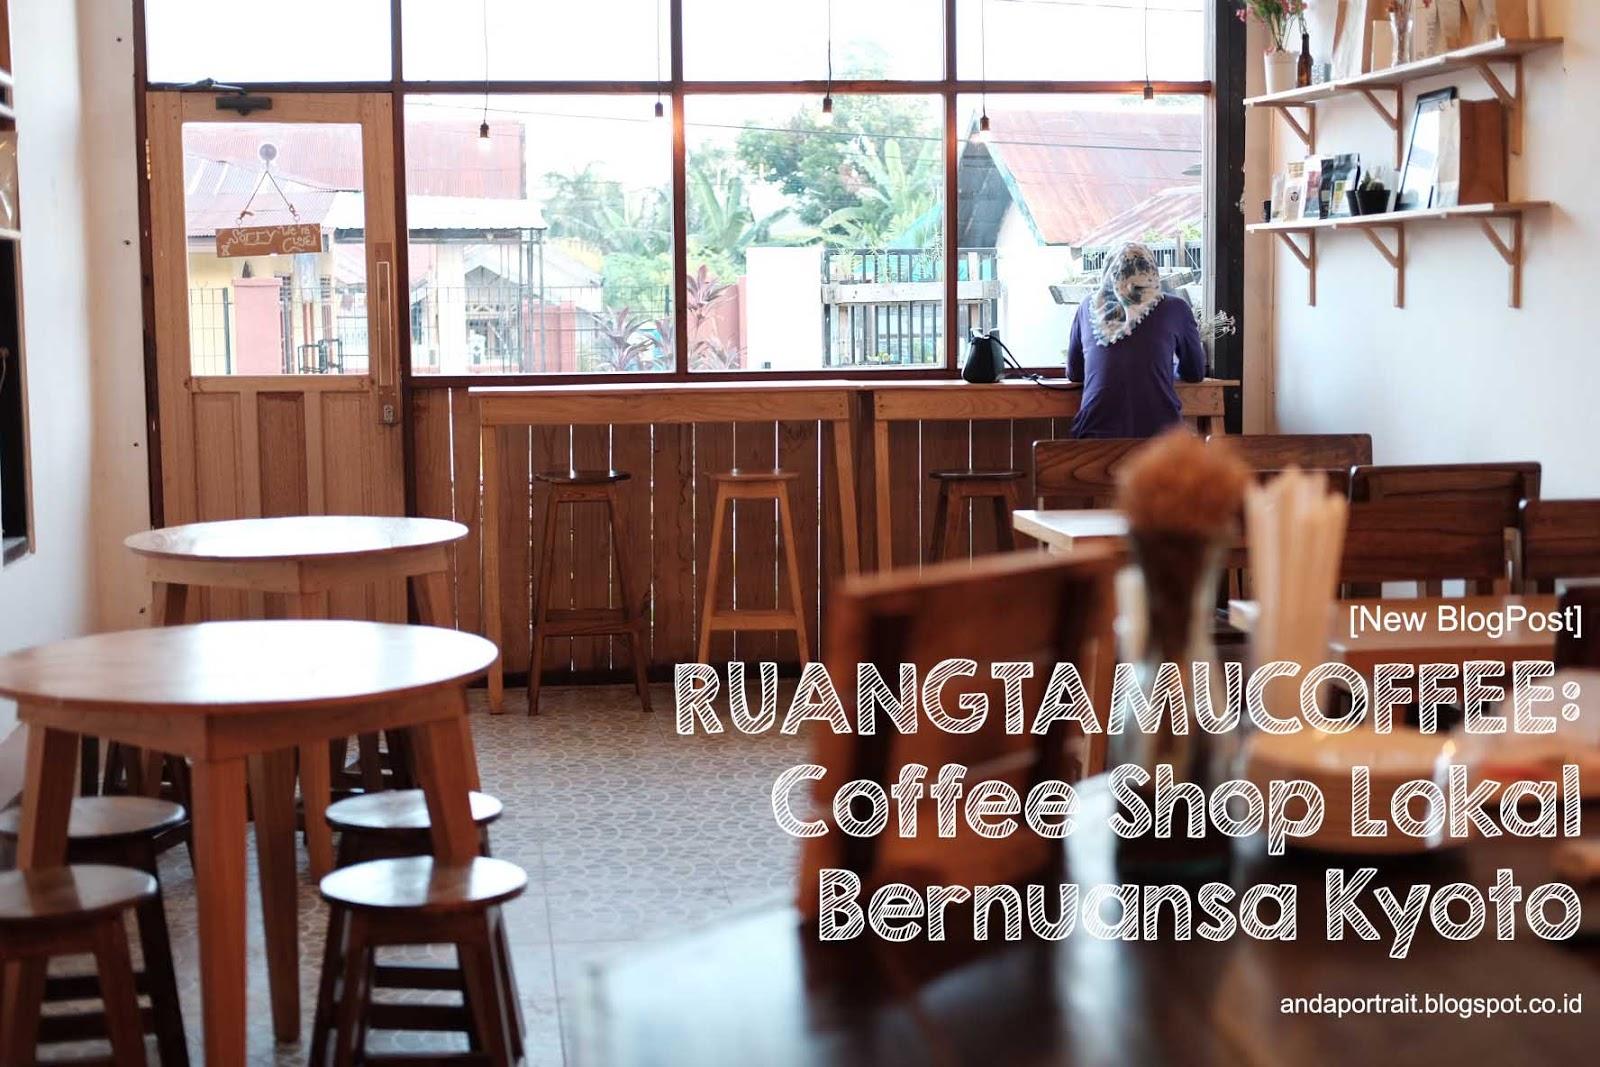 Ruangtamu Coffee Coffee Shop Lokal Bernuansa Kyoto Andaportrait